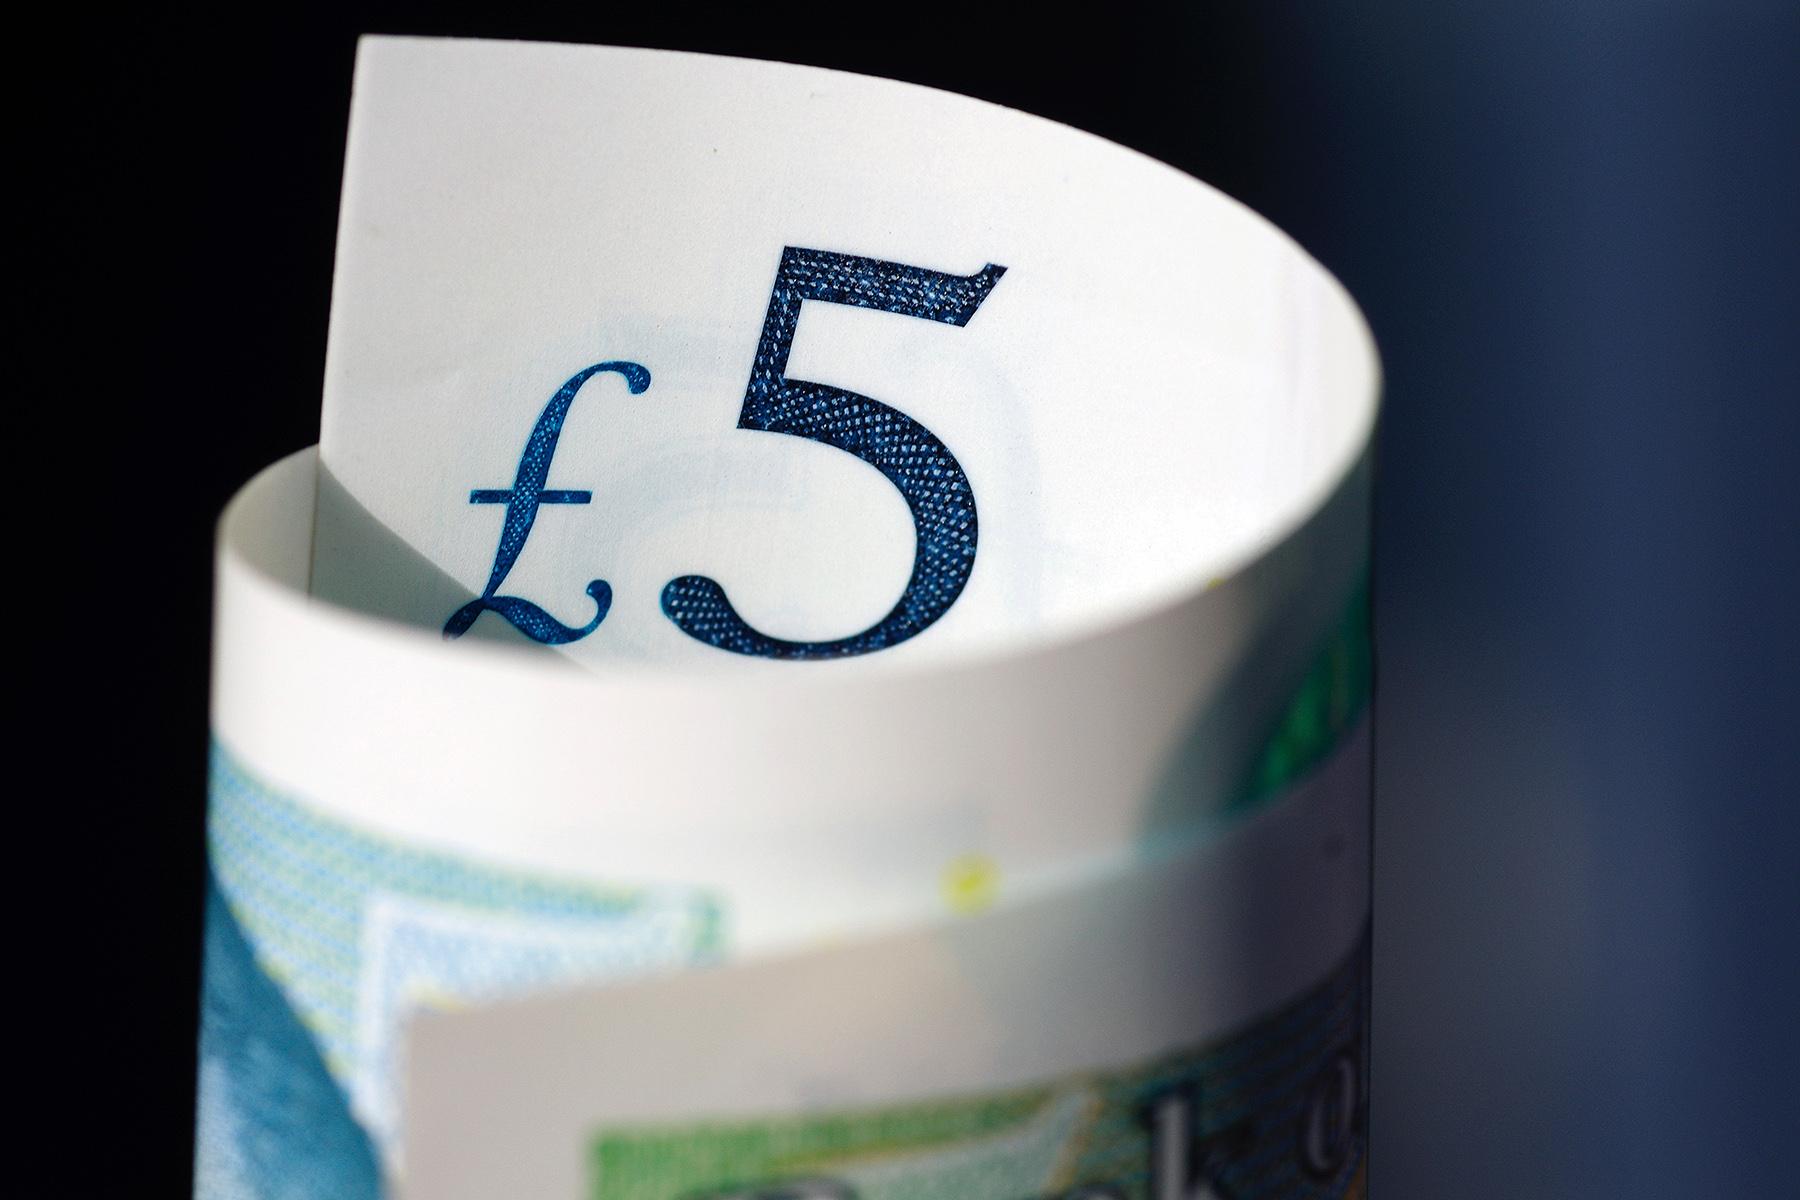 Five British pounds